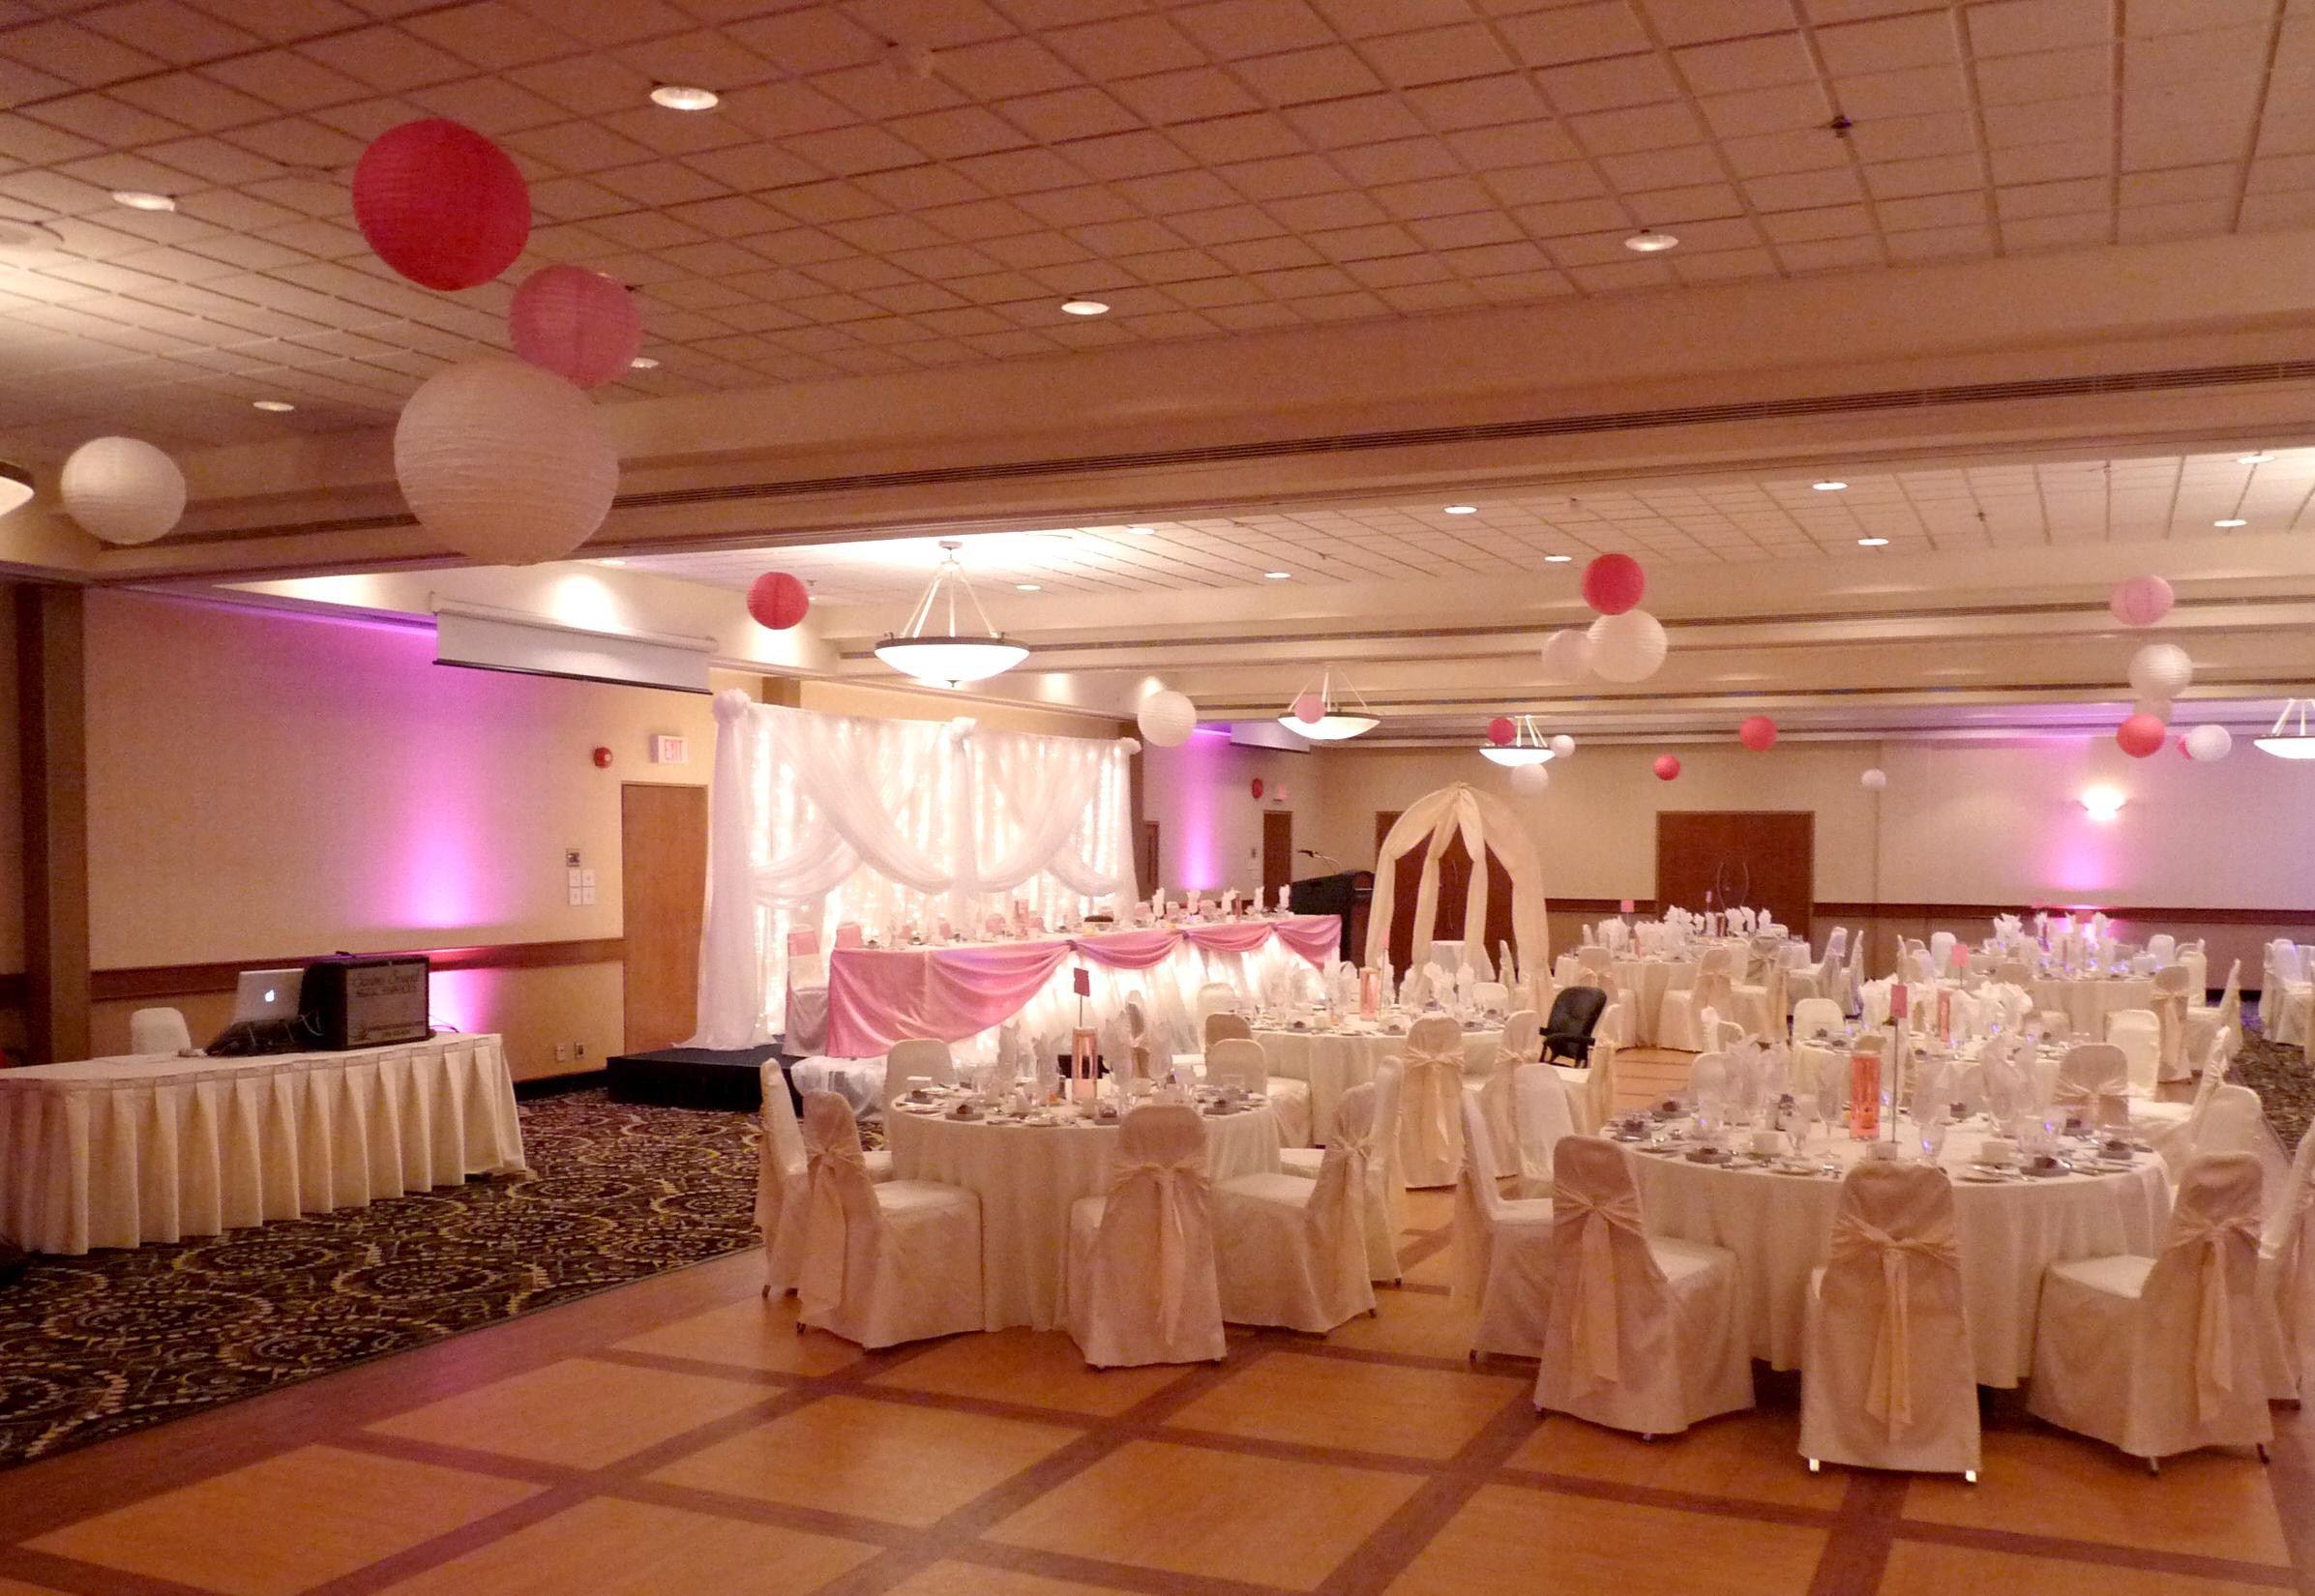 Pink uplighting to match decor